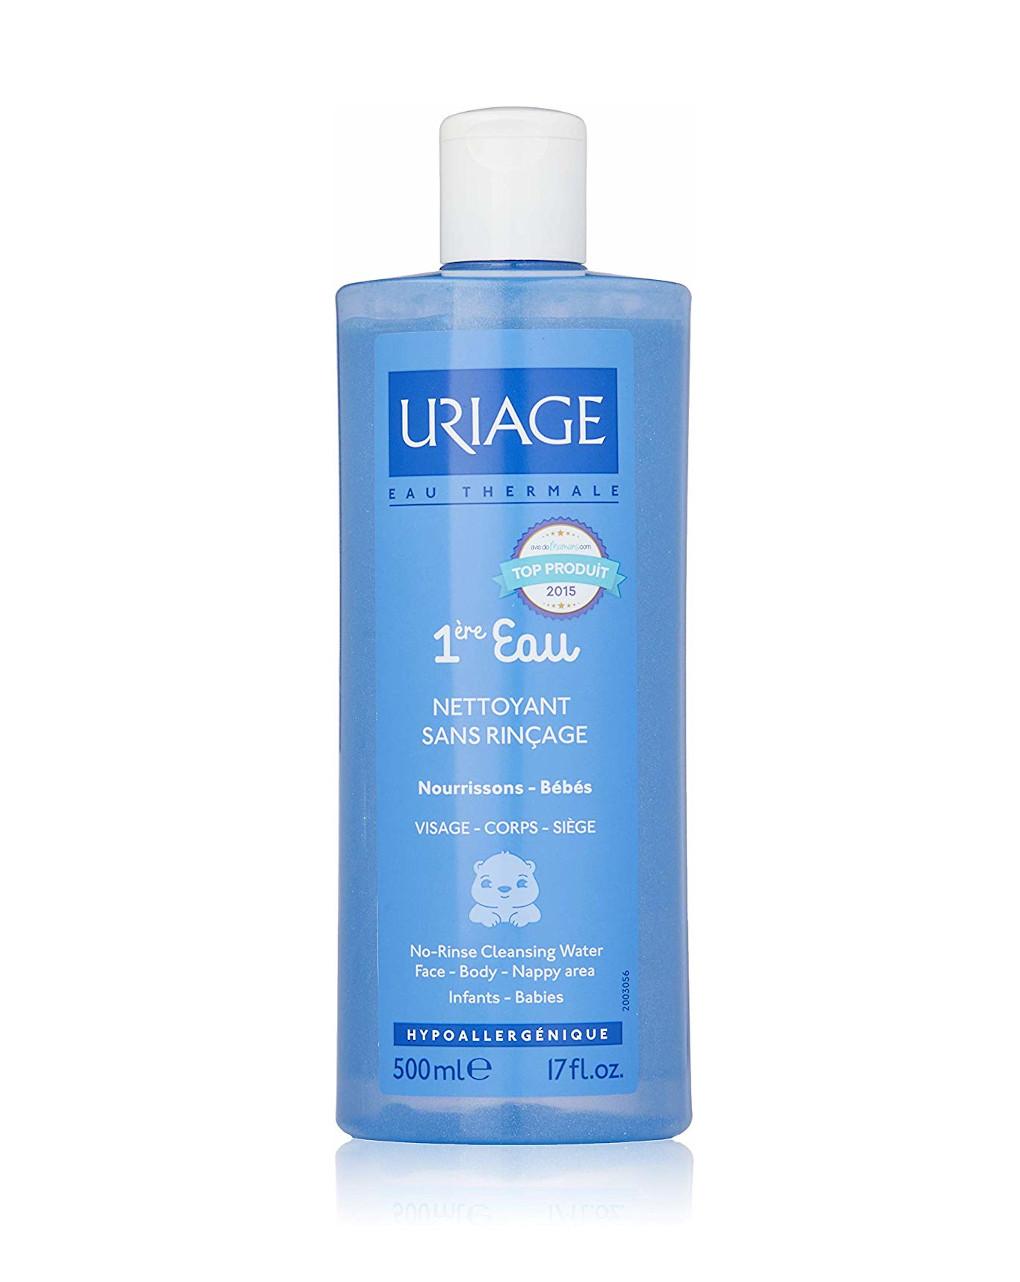 Uriage - acqua detergente delicata 500 ml - Uriage